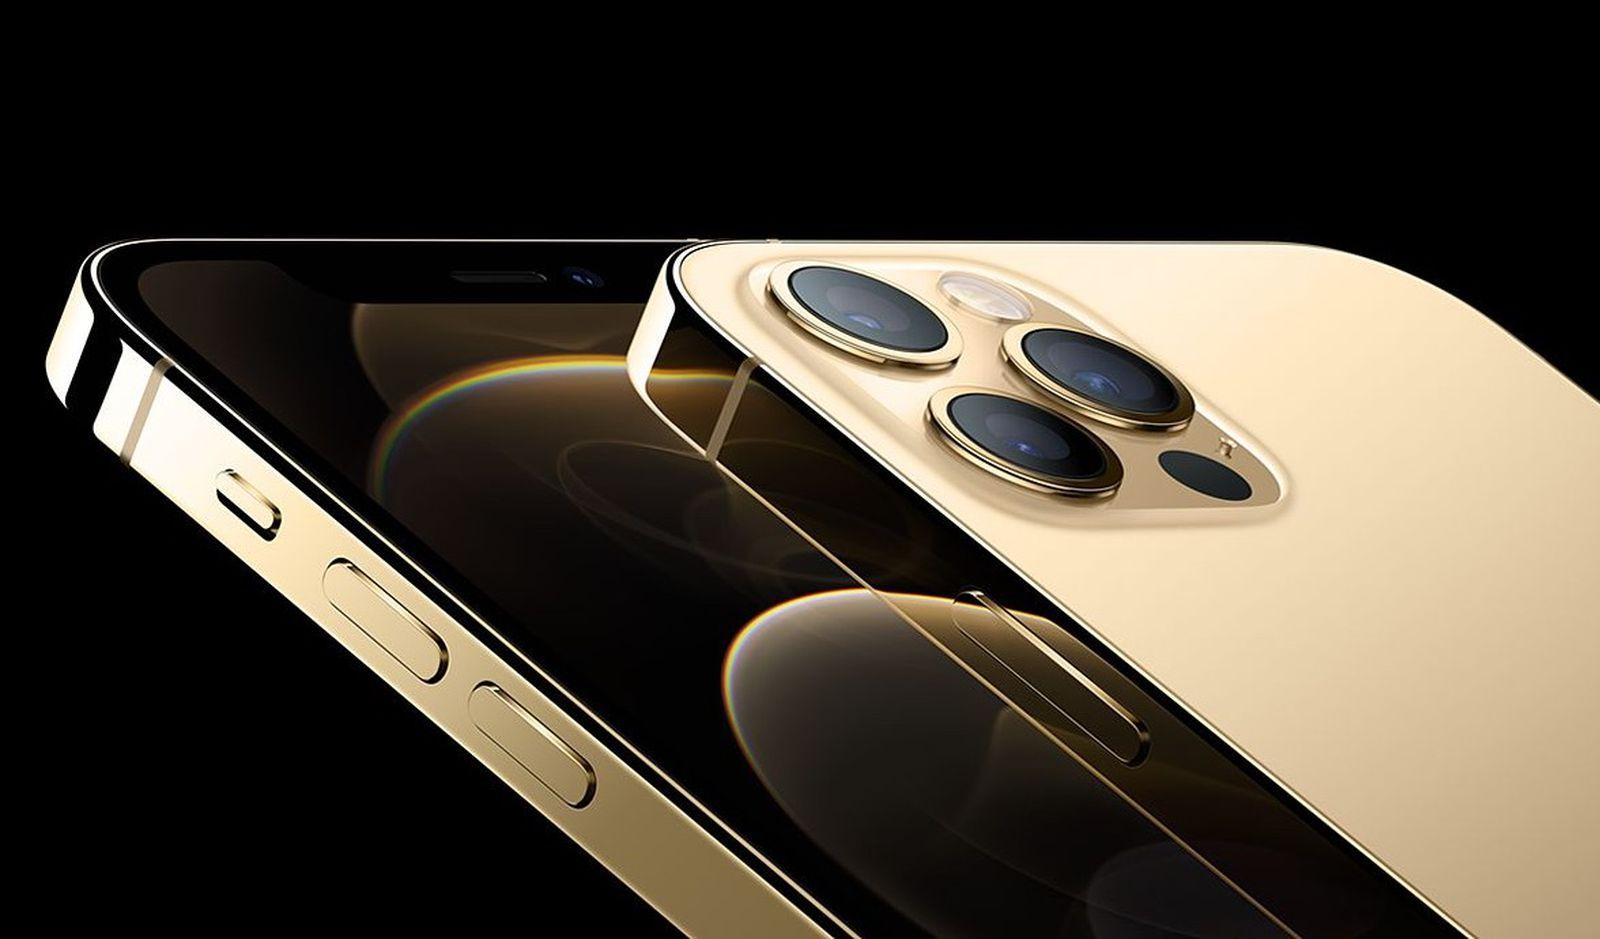 Раскрыта реальная ёмкость аккумулятора iPhone 12 Pro Max